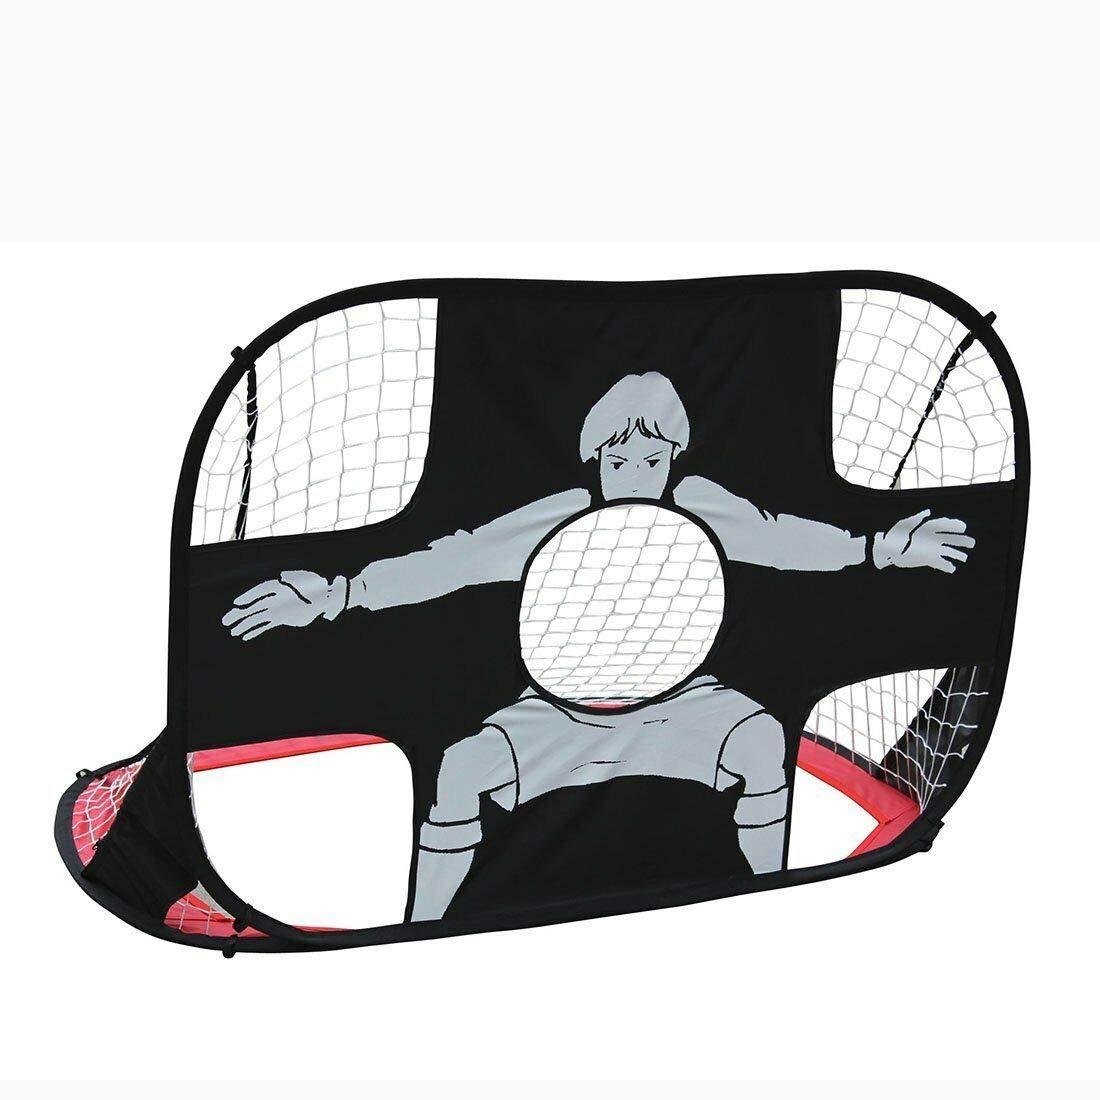 SANOTO Soccer Goal, Pop Up Kids Soccer Net for Backyard Outdoor Indoor Playing by SANOTO (Image #1)